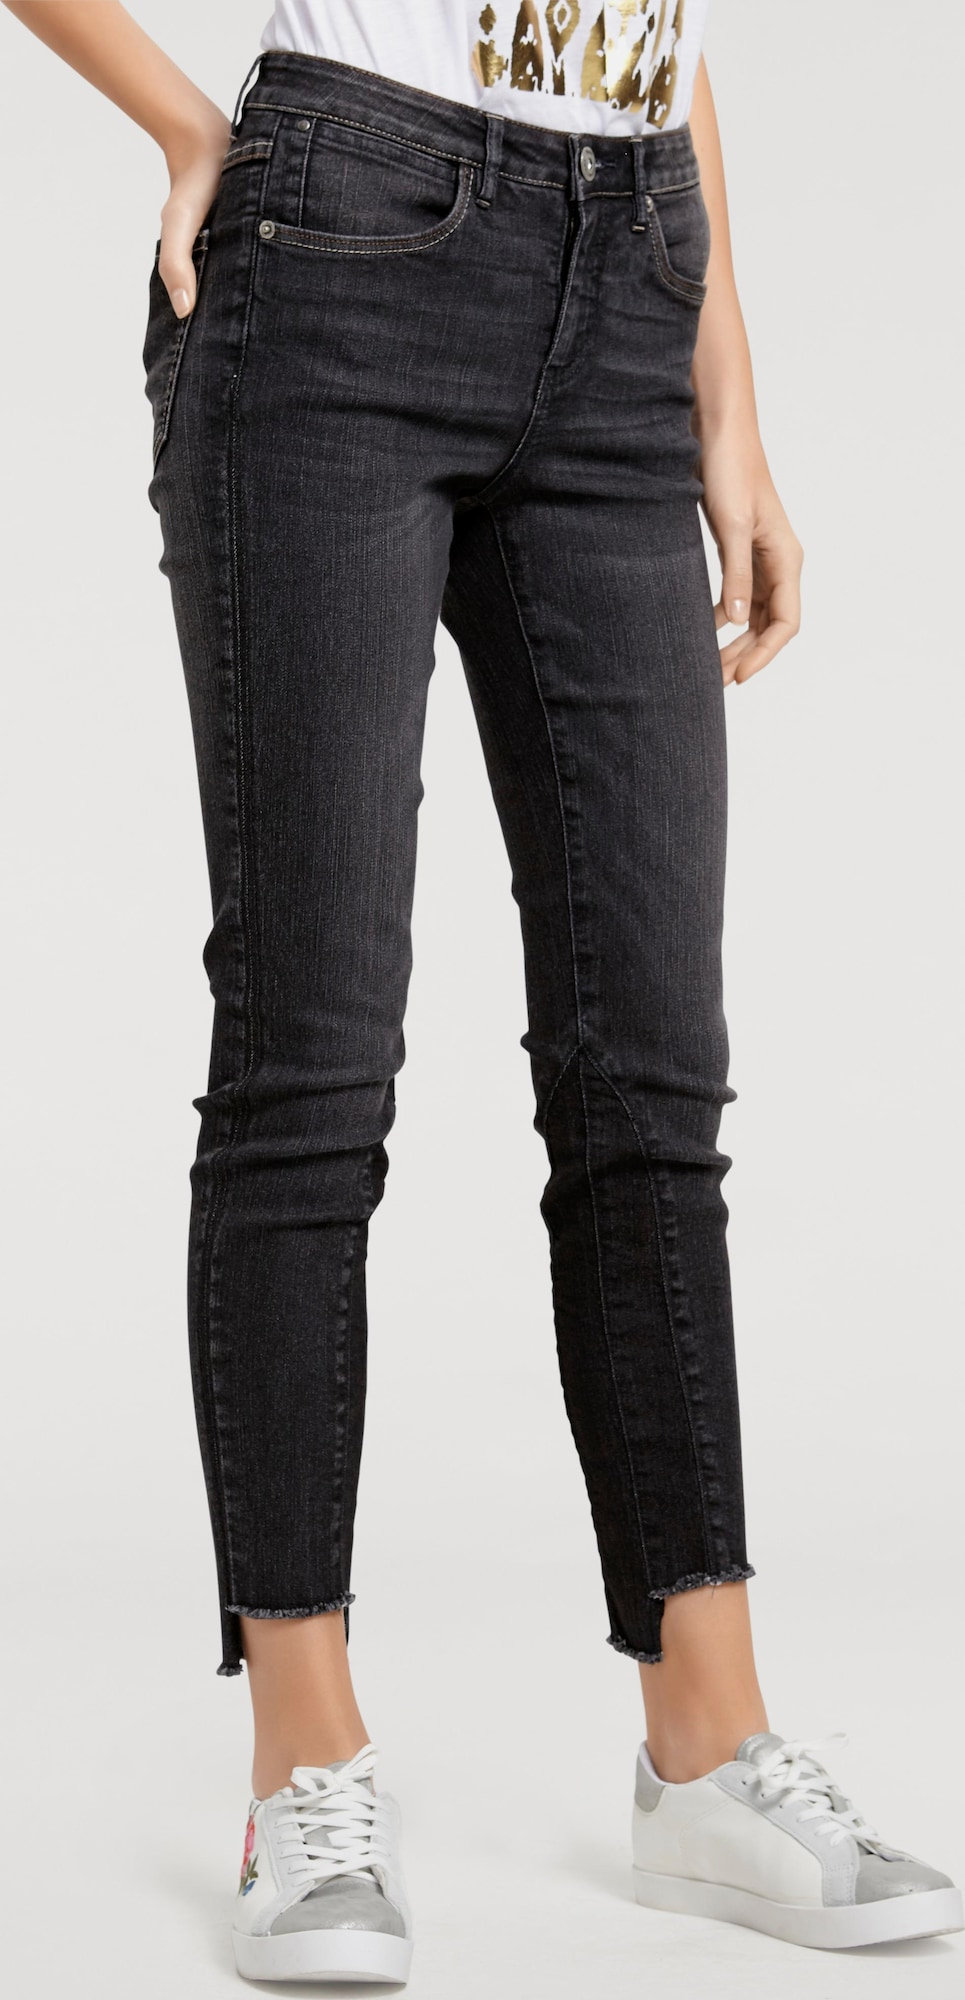 b c best connections by heine 7 8 jeans mit fransen in. Black Bedroom Furniture Sets. Home Design Ideas